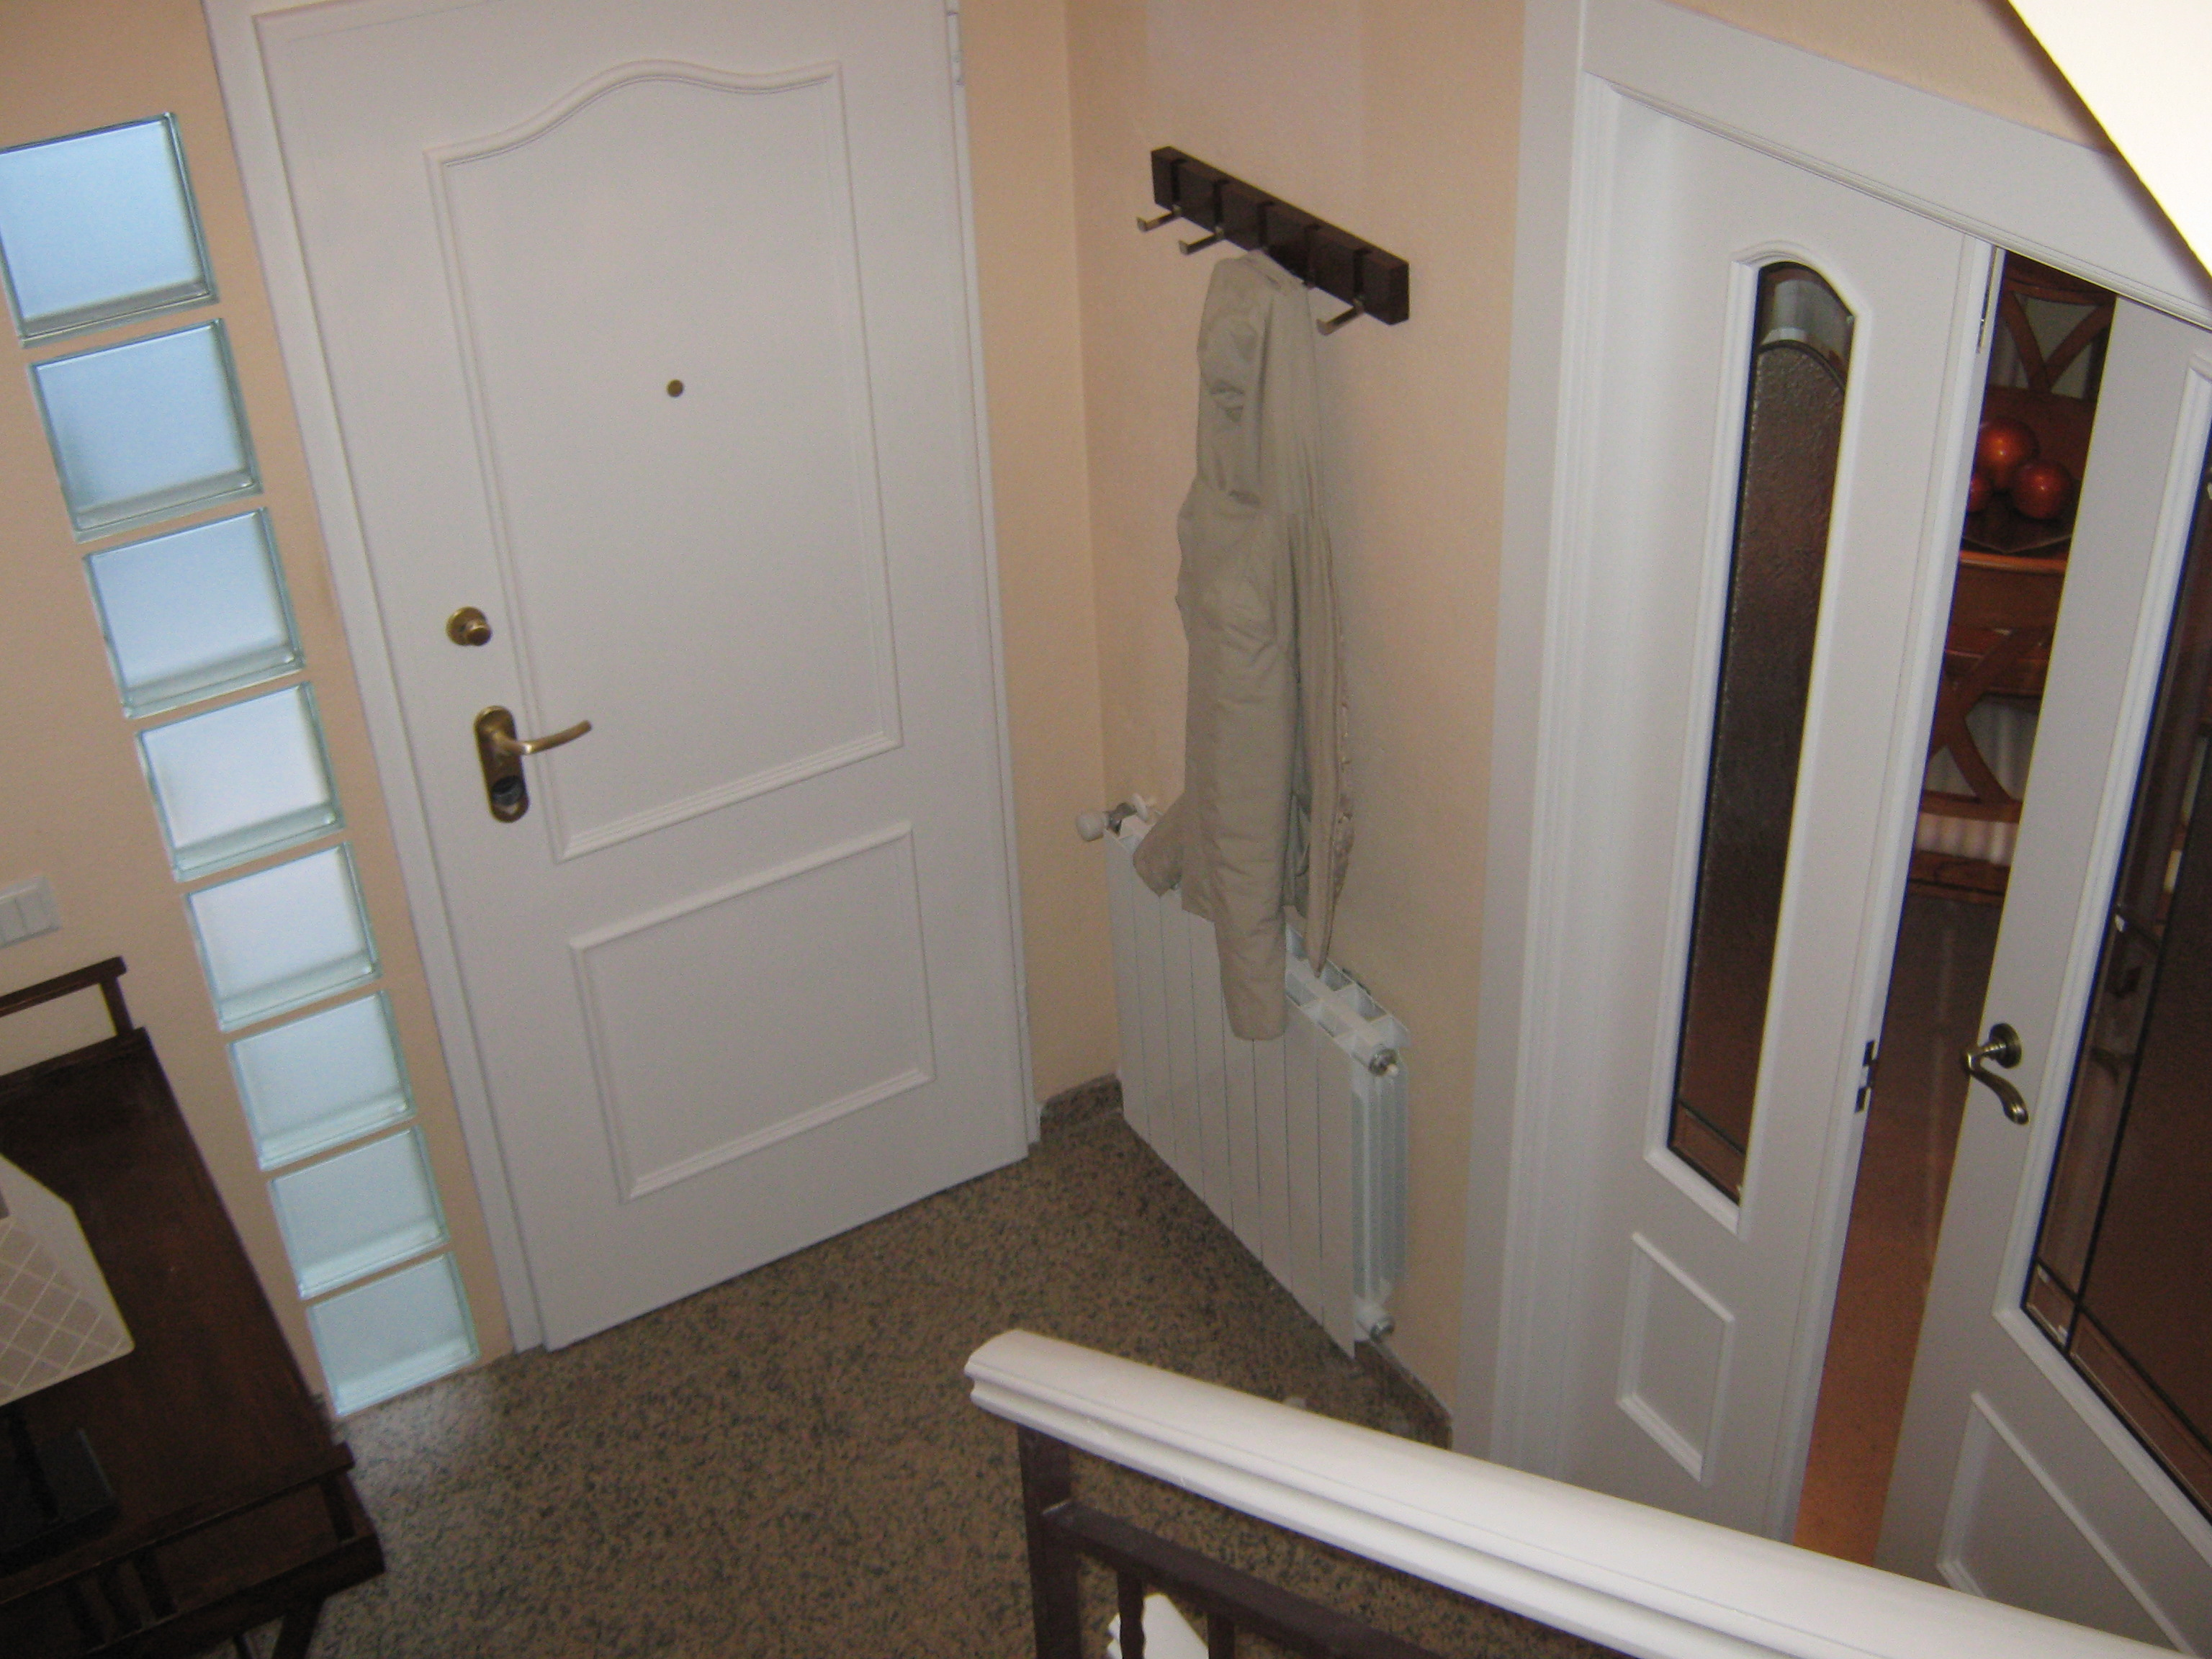 Lacar muebles barnizados idee per interni e mobili for Lacar muebles en blanco